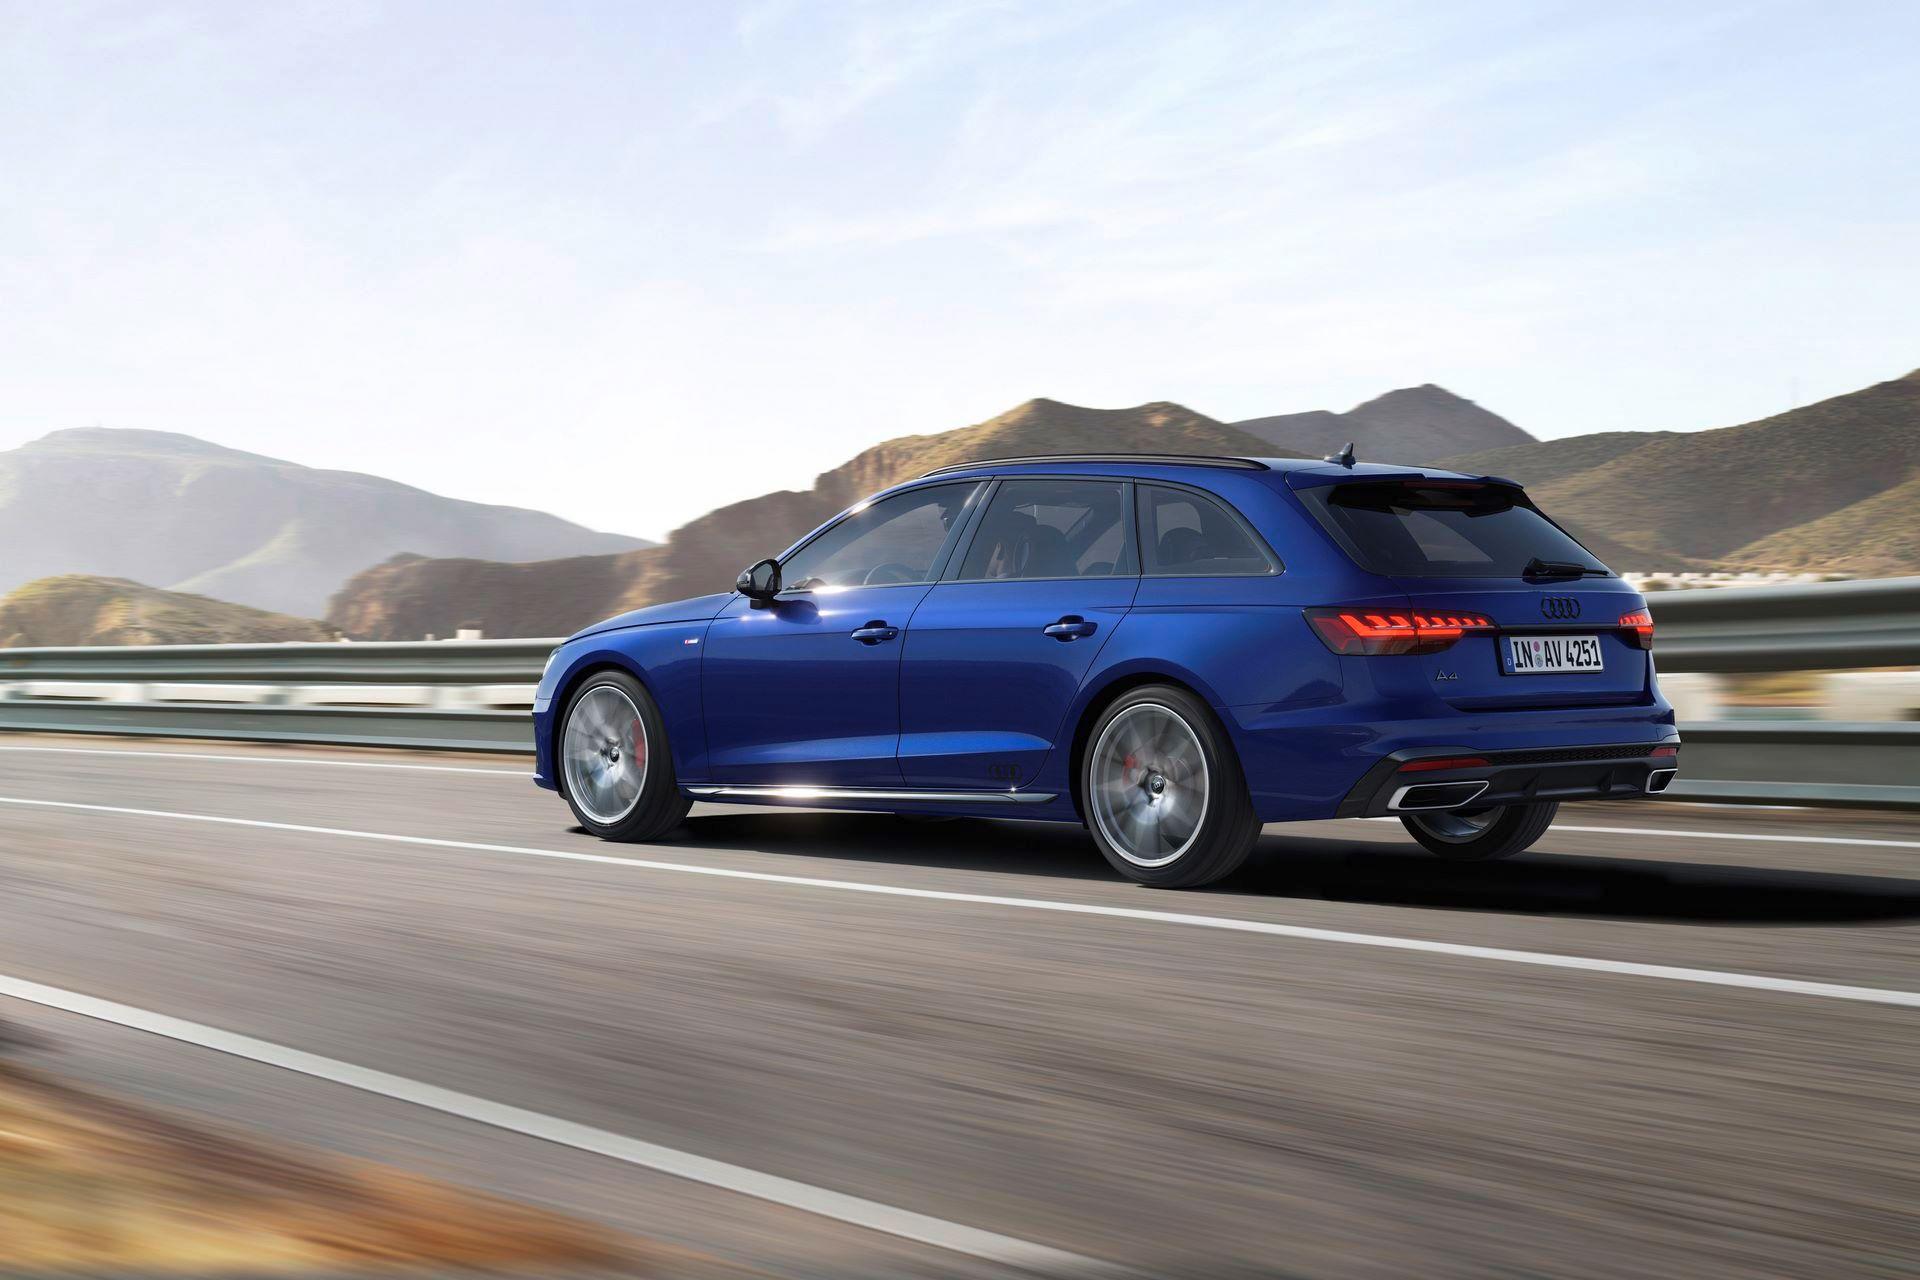 Audi-A4-A5-Q7-Q8-Competition-And-Competition-Plus-Trims-56